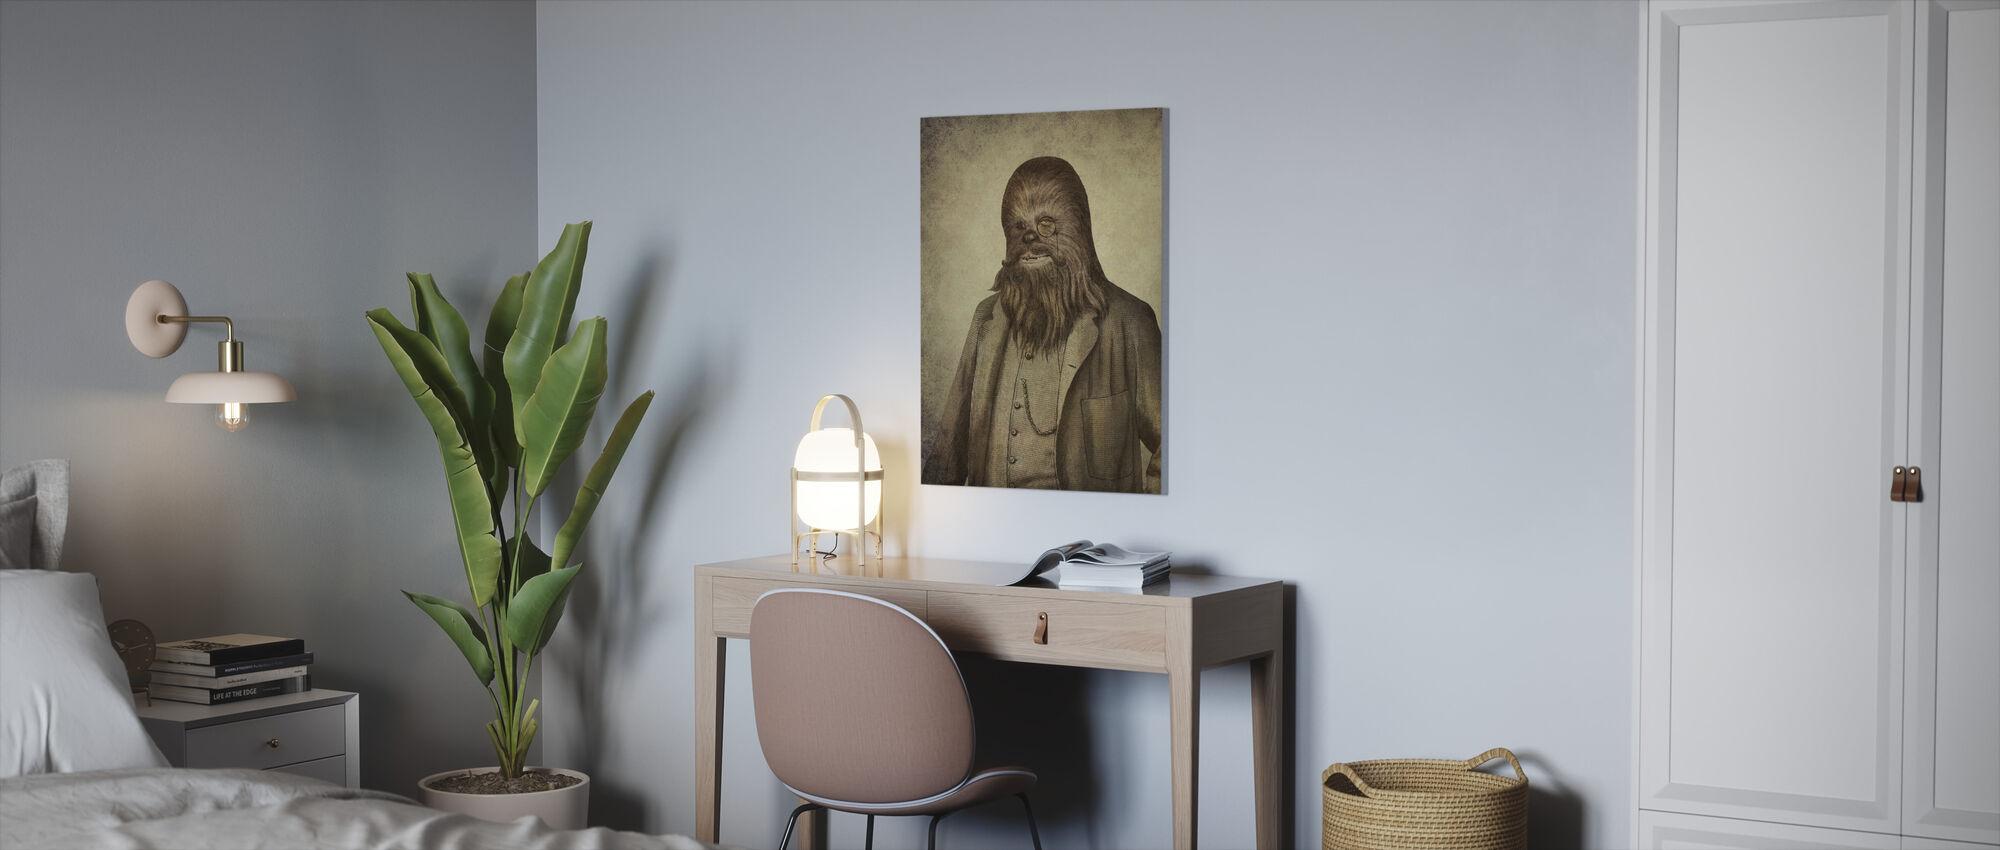 Victorian Wars Chancellor Chewman - Canvas print - Office